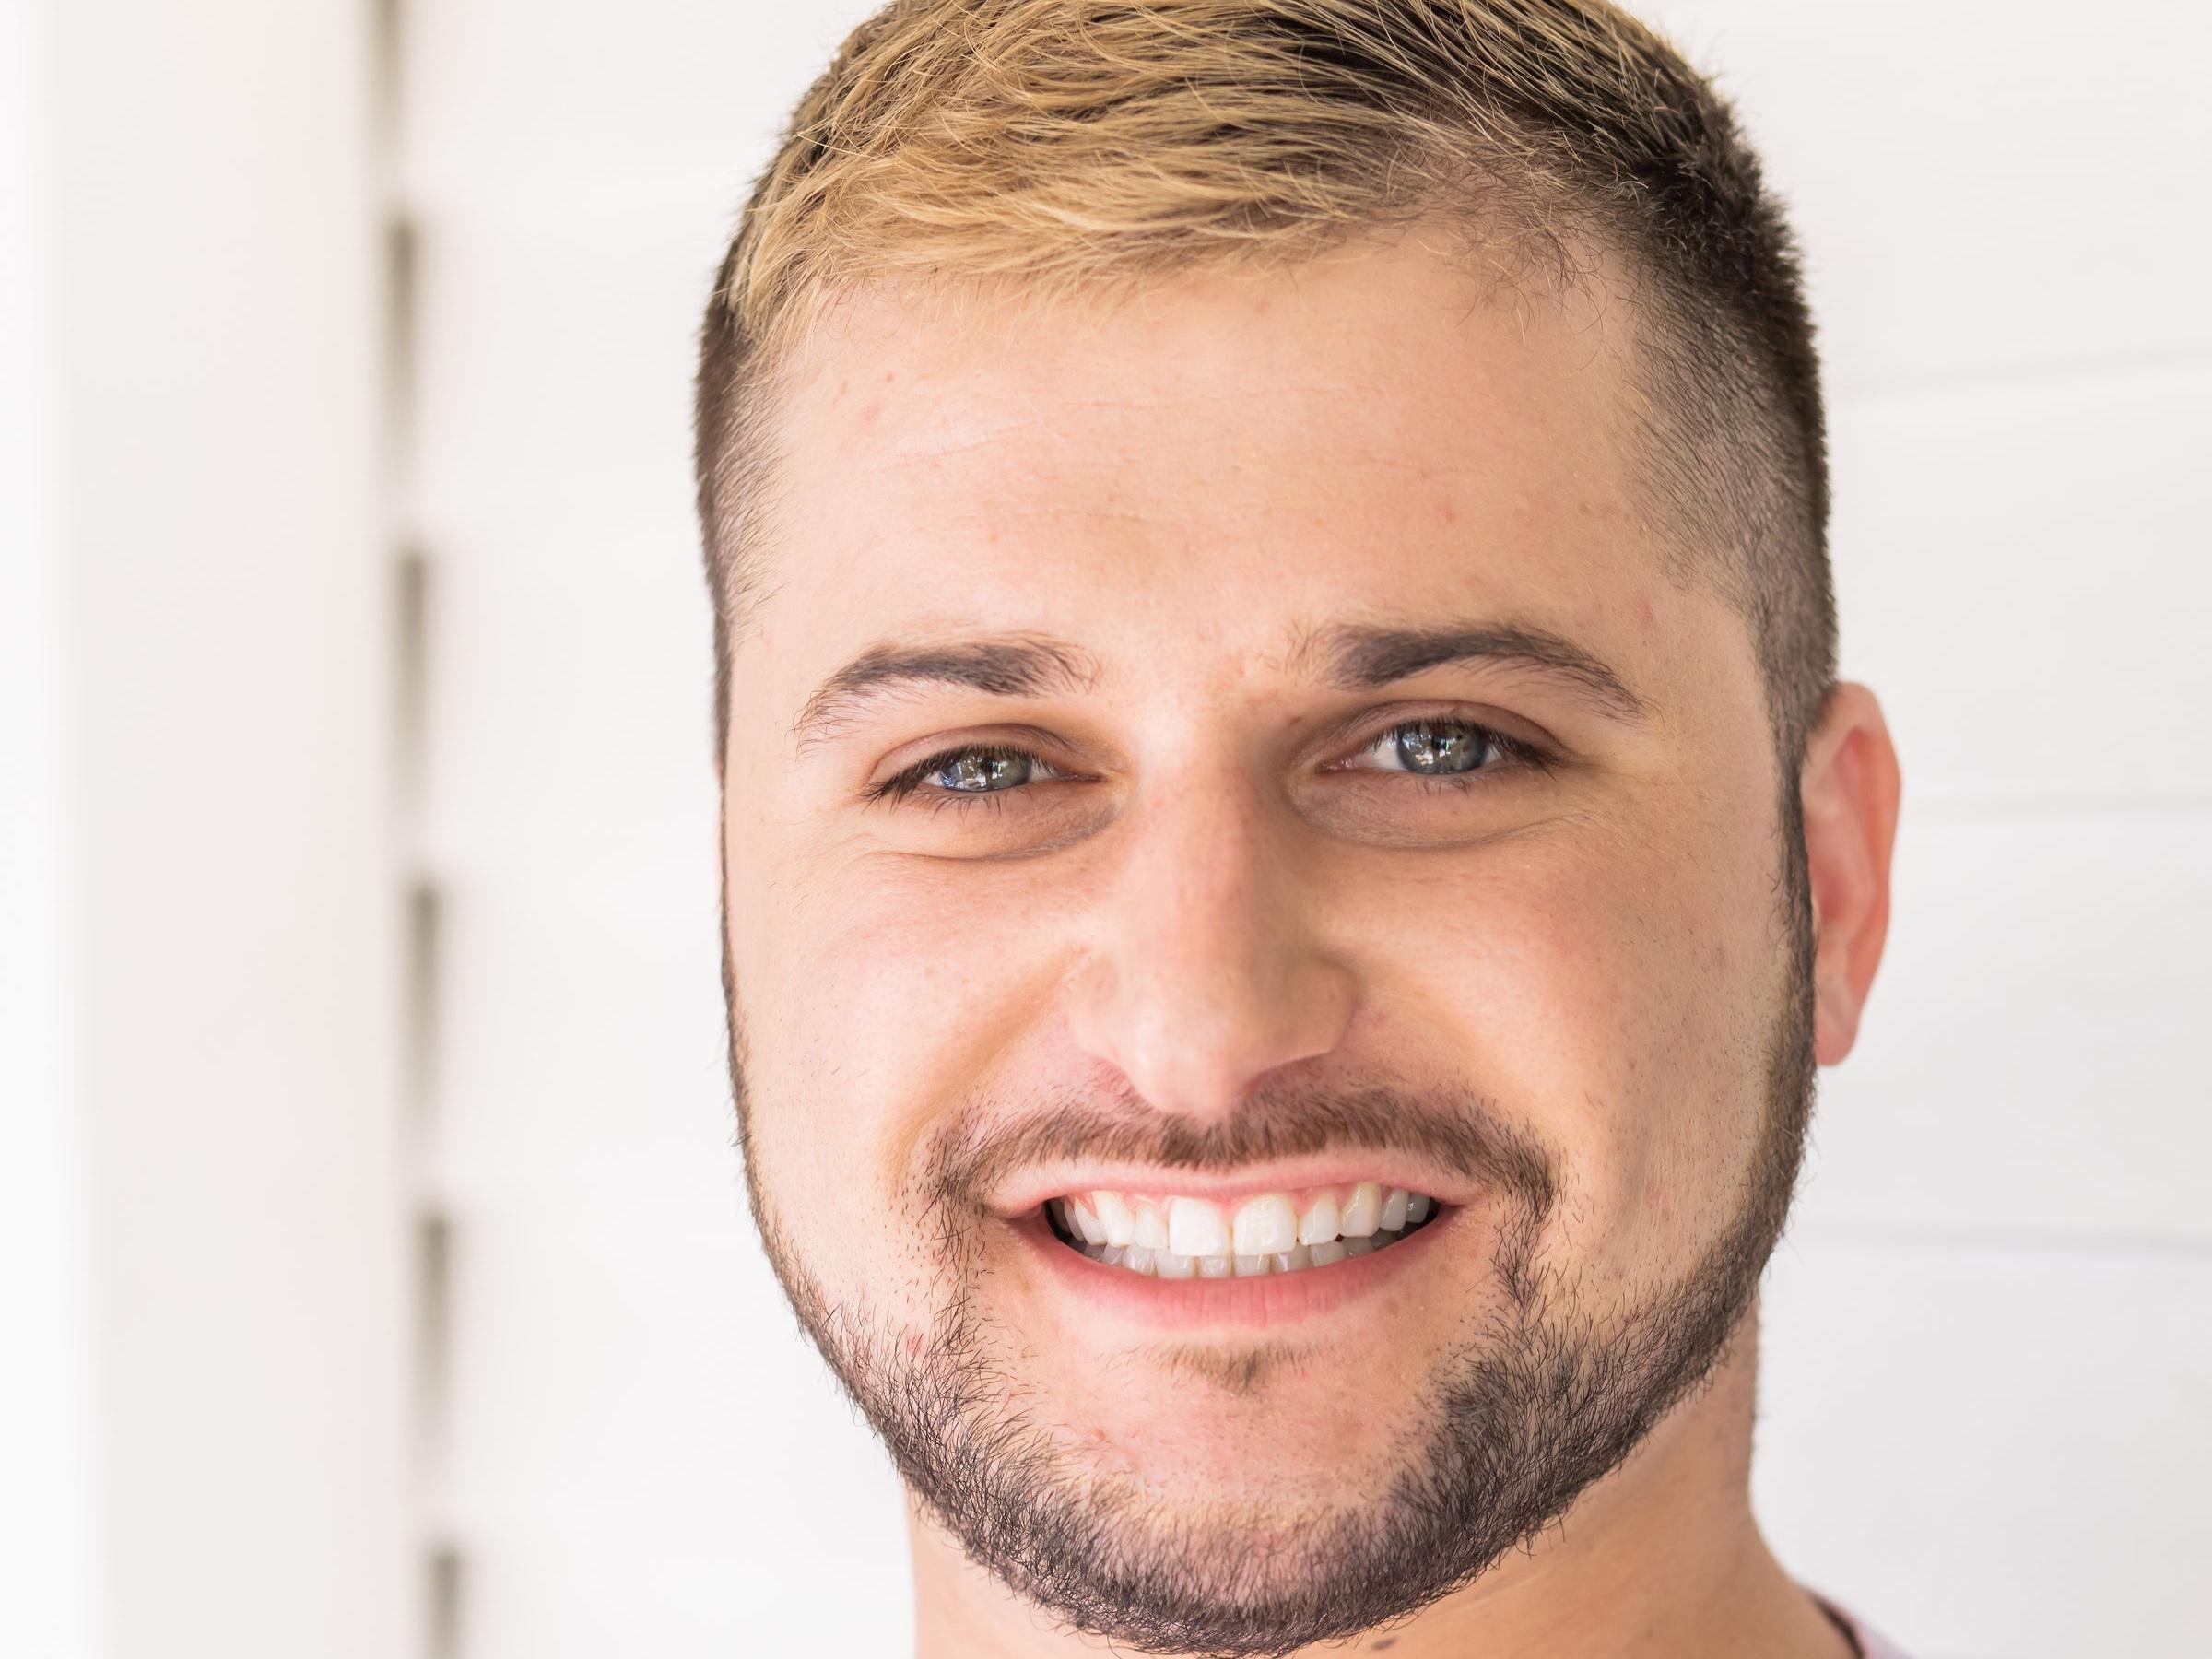 Ryan Tibbetts